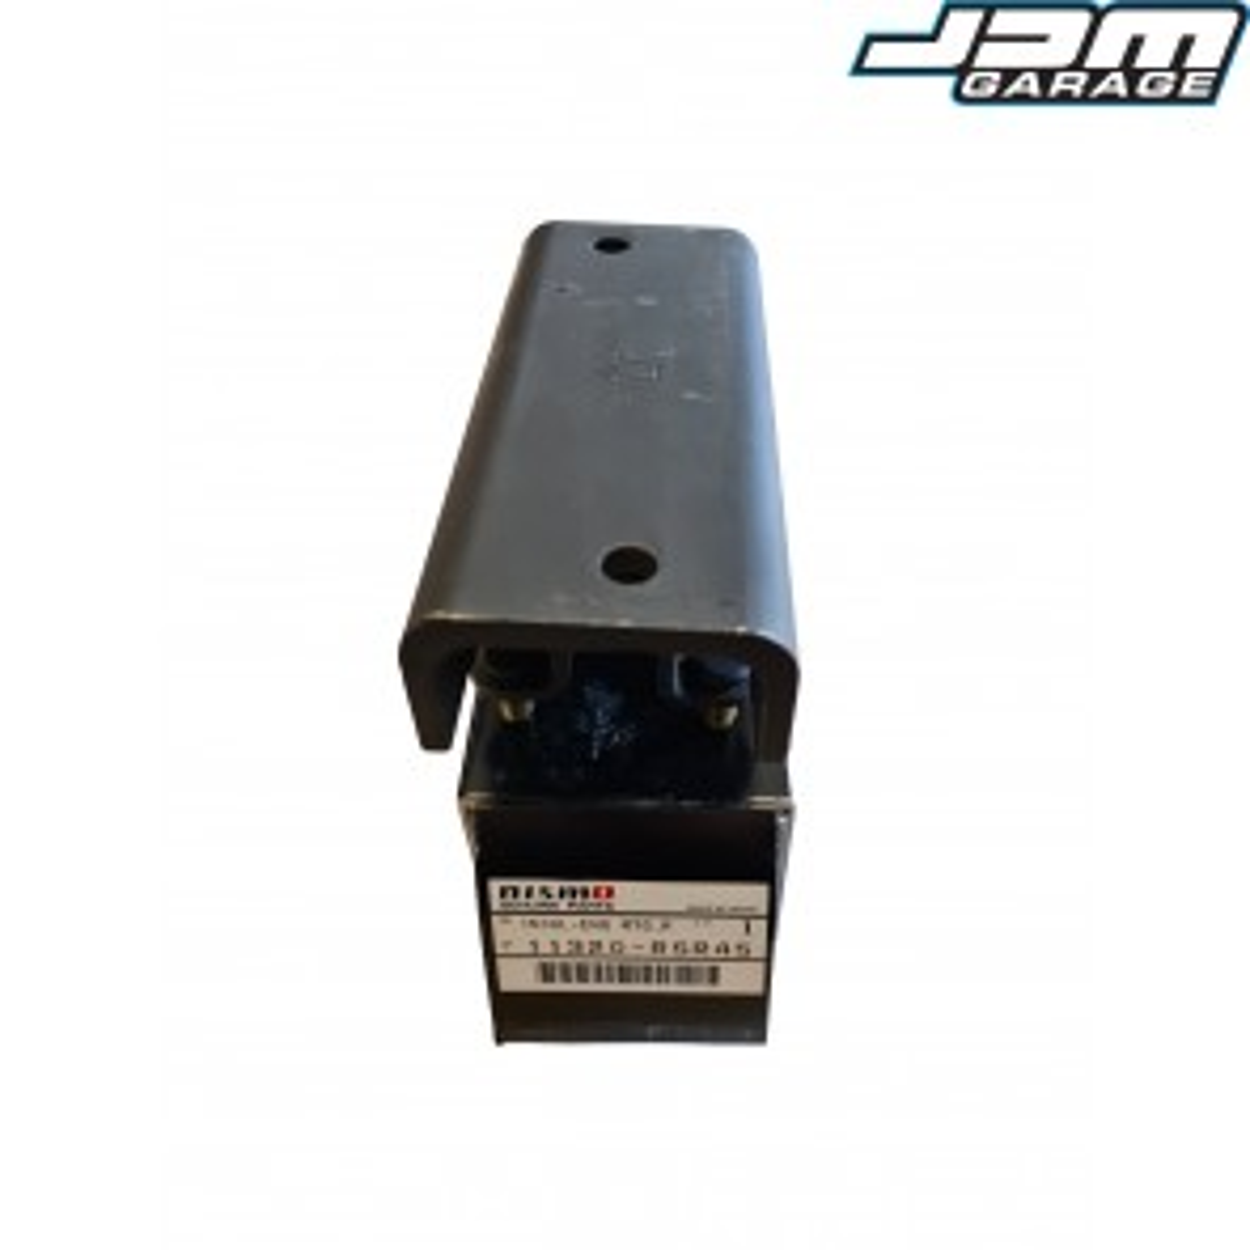 Genuine Nismo Heavy Duty RB26DETT Gearbox Mount For Nissan Skyline R34 GTR 11320-RSR45